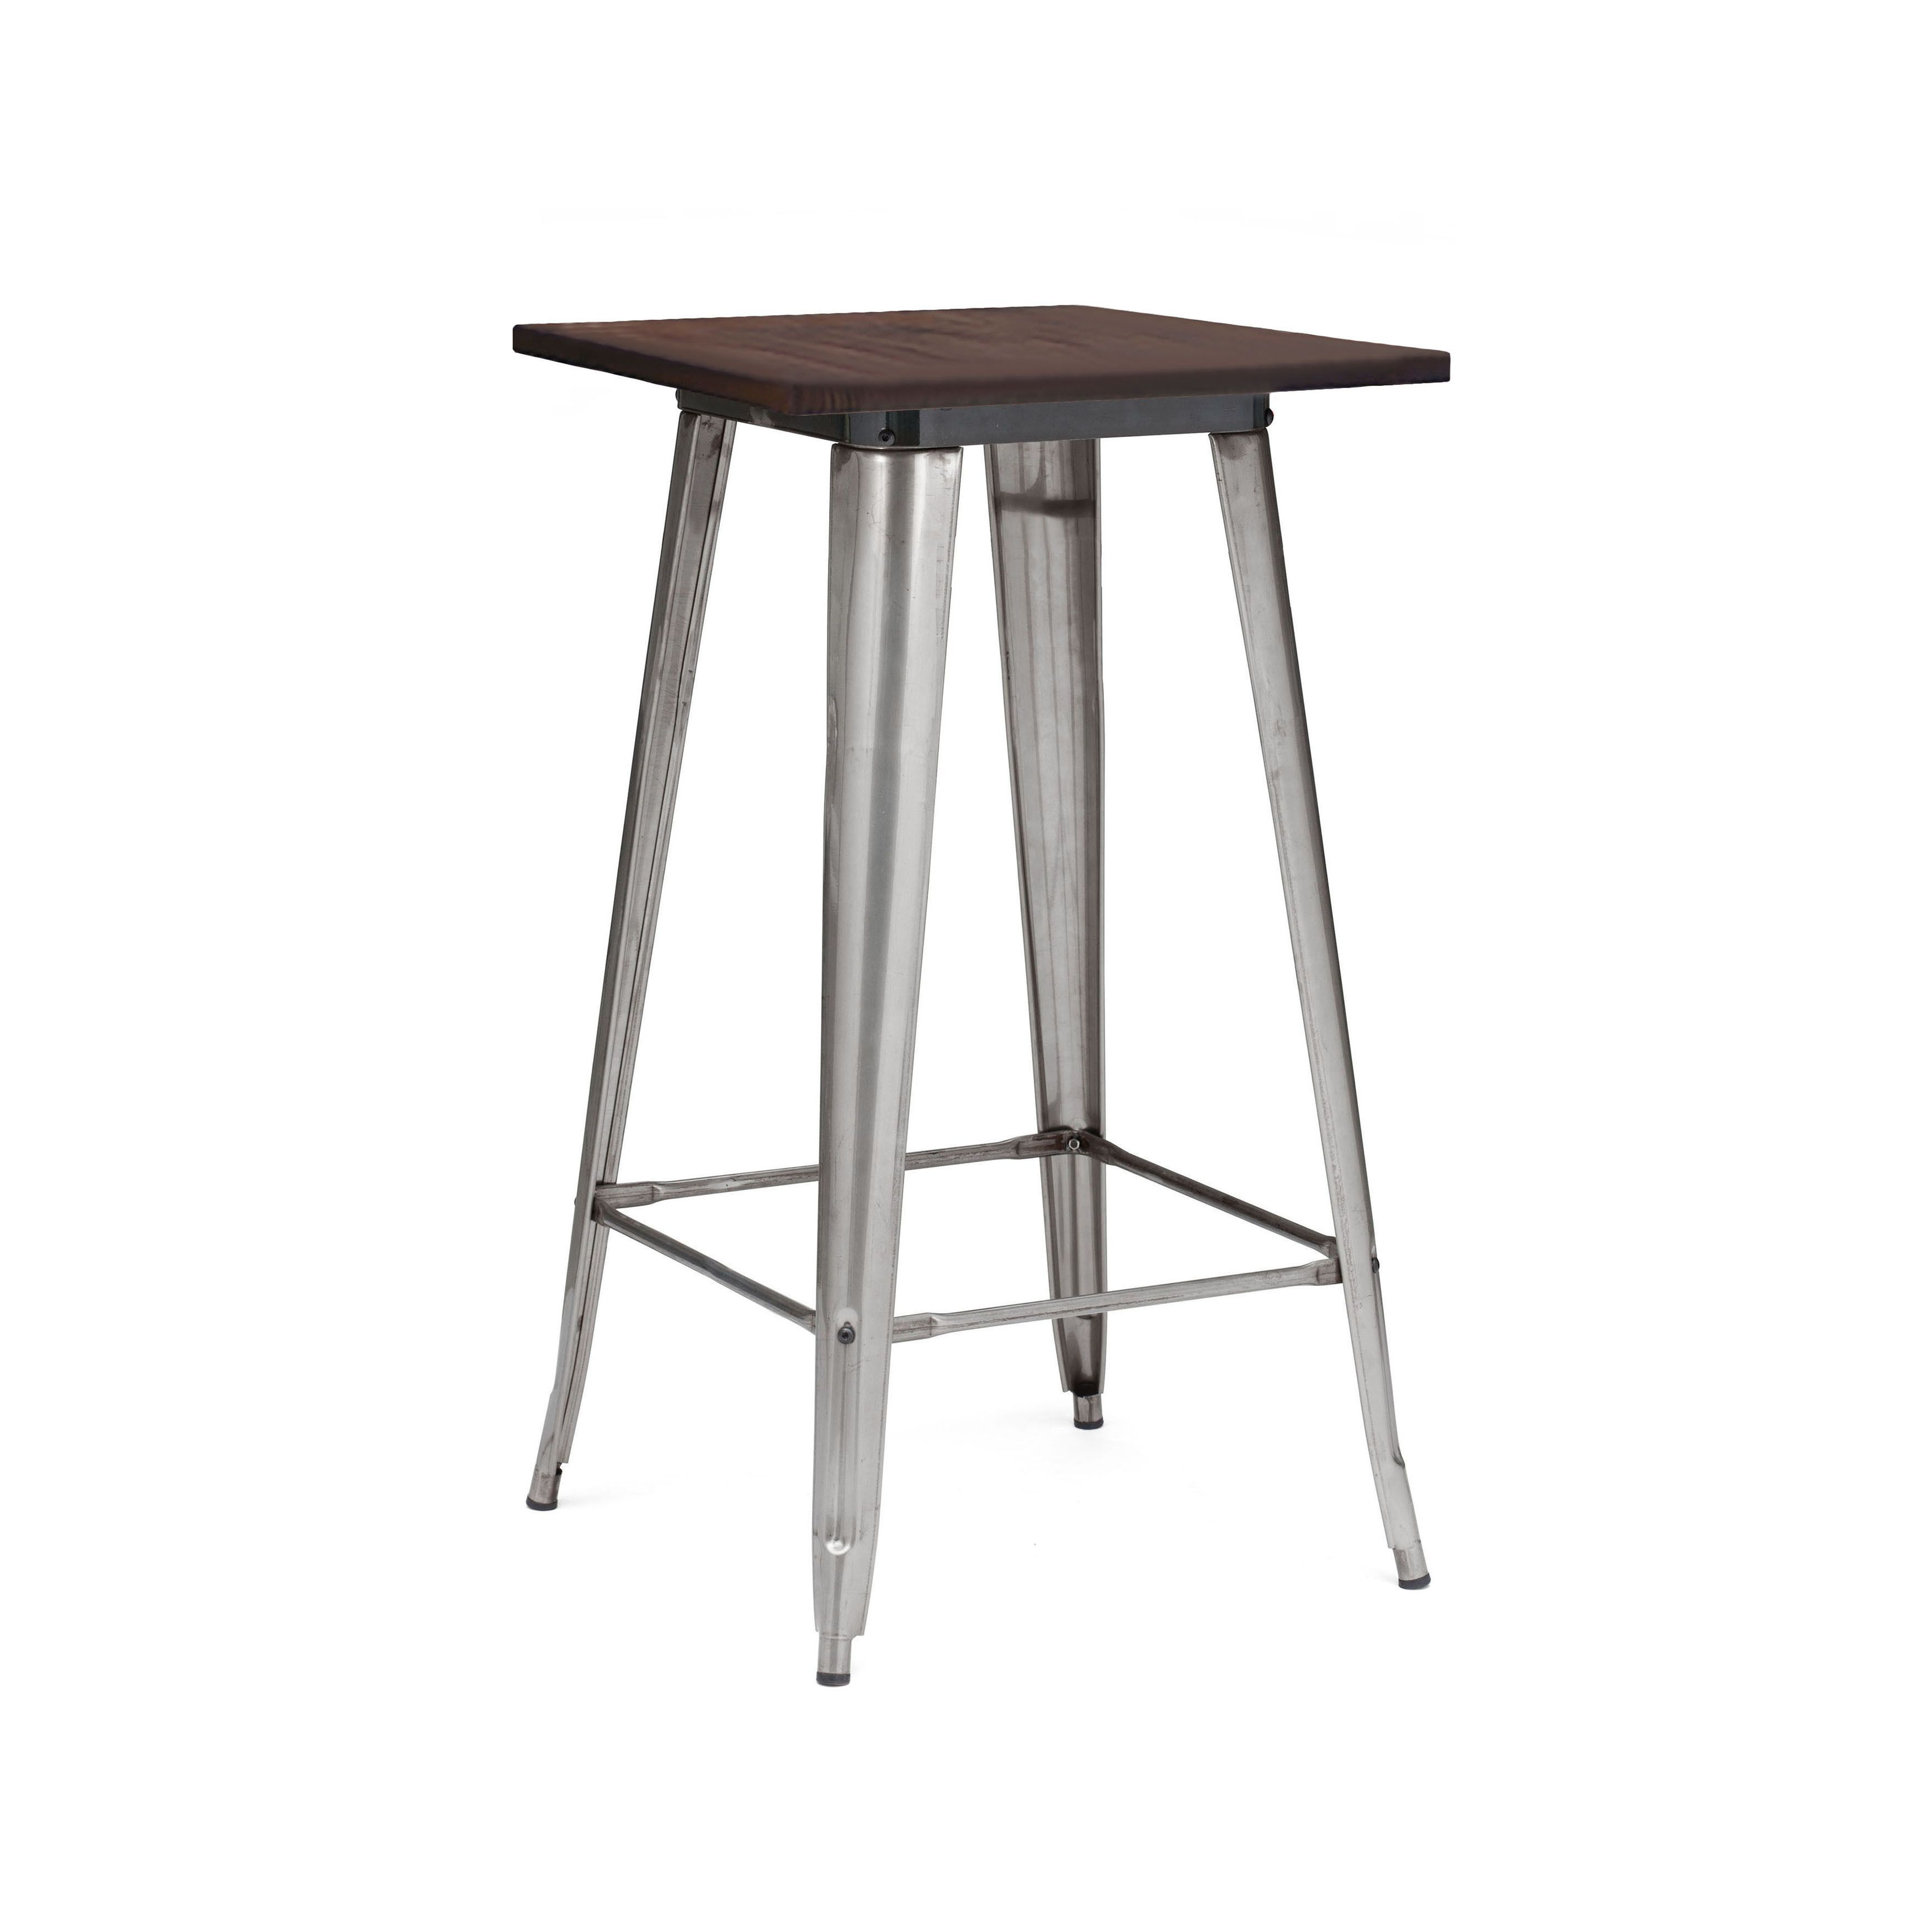 Amalfi Clear Gun Wood Top Steel Bar Table